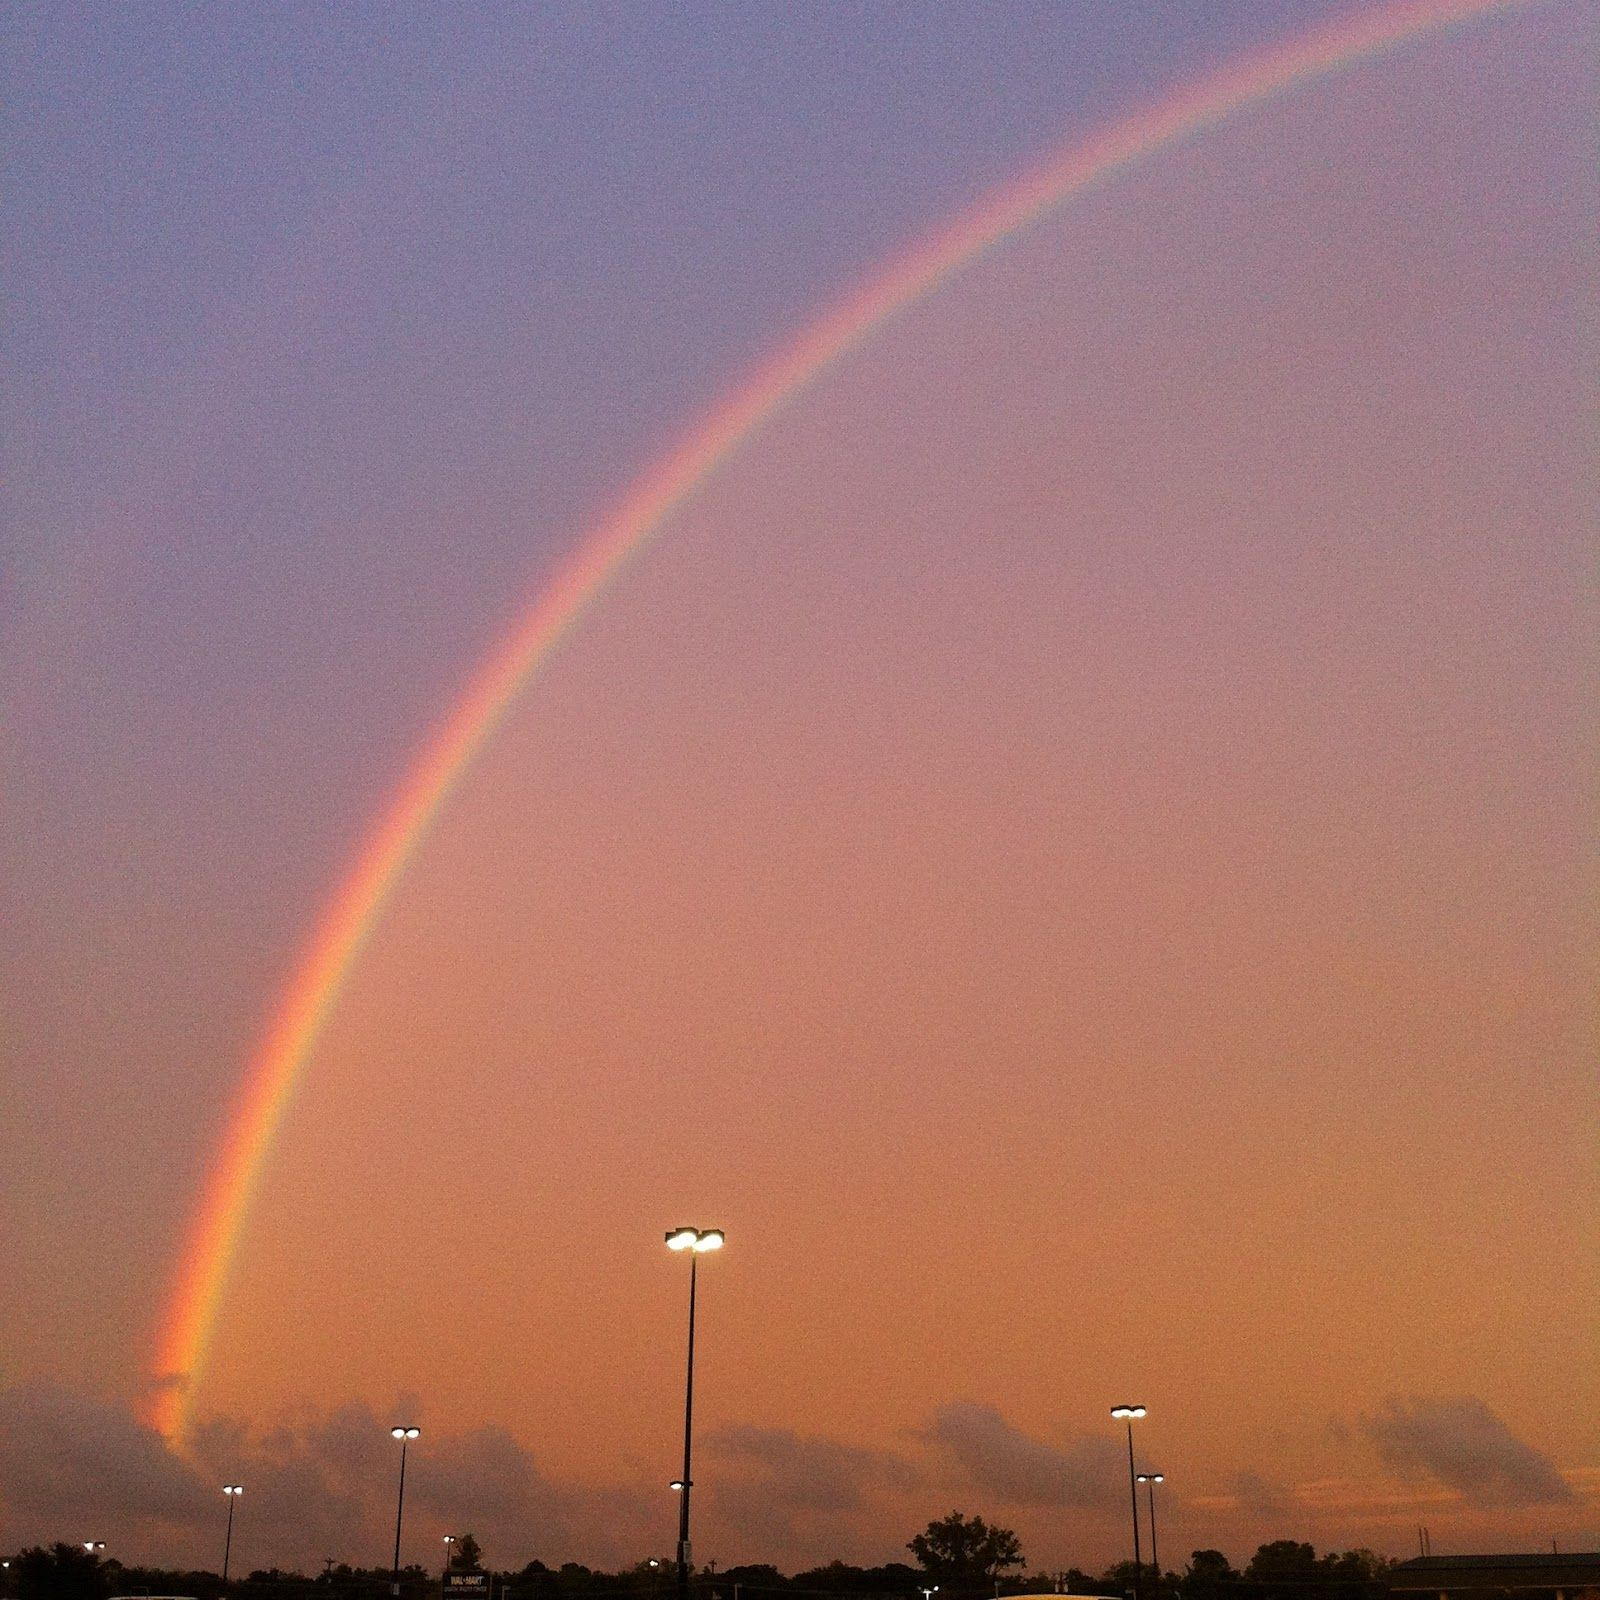 rainbows | Sunshine, Lollipops and RAINBOWS!!!